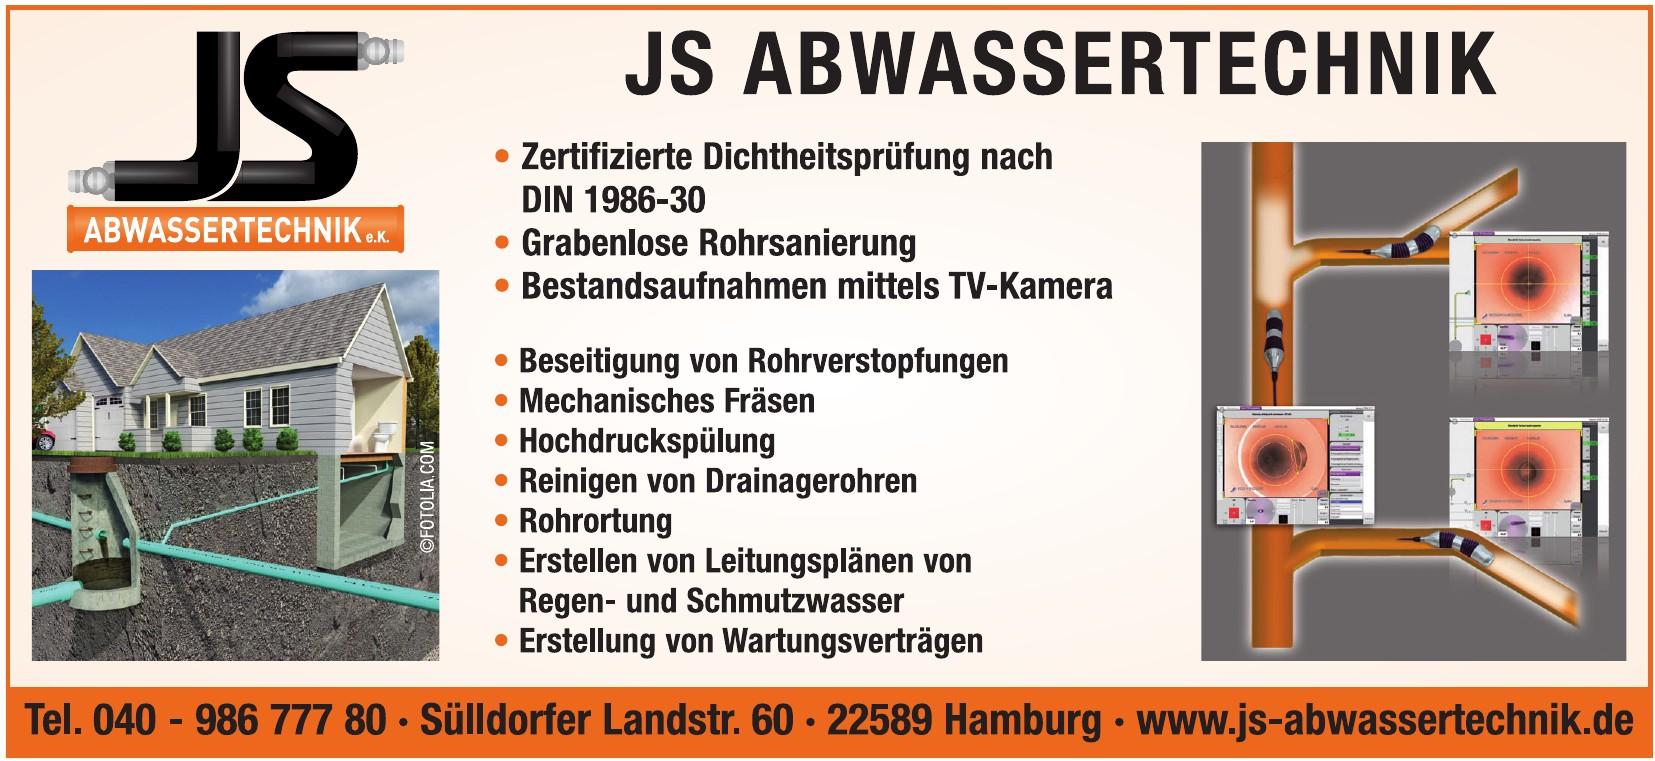 JS Abwassertechnik